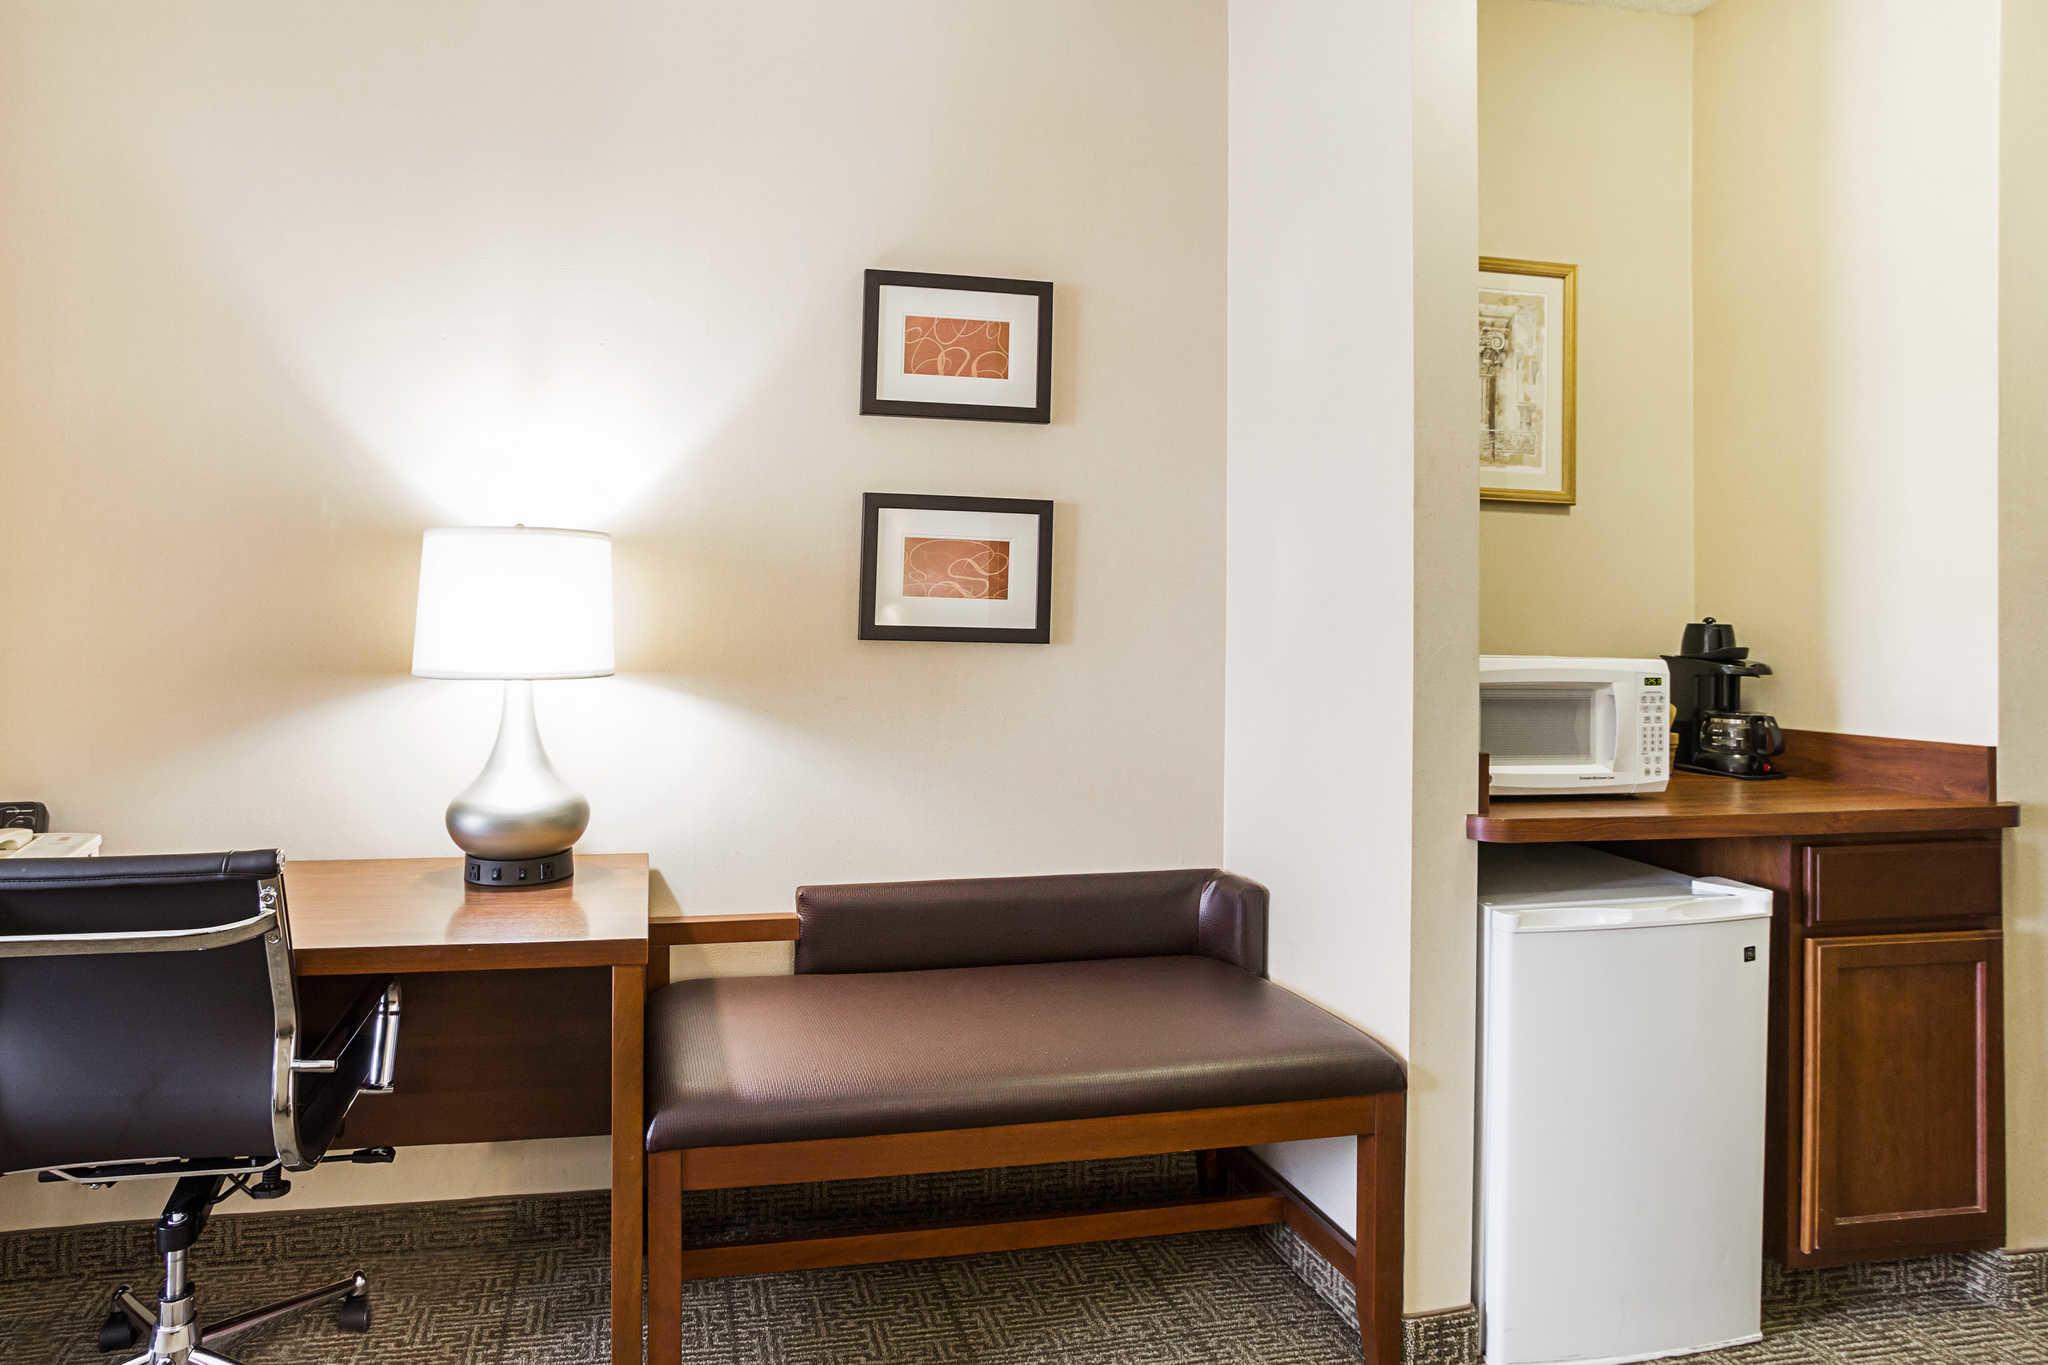 Comfort Suites image 38